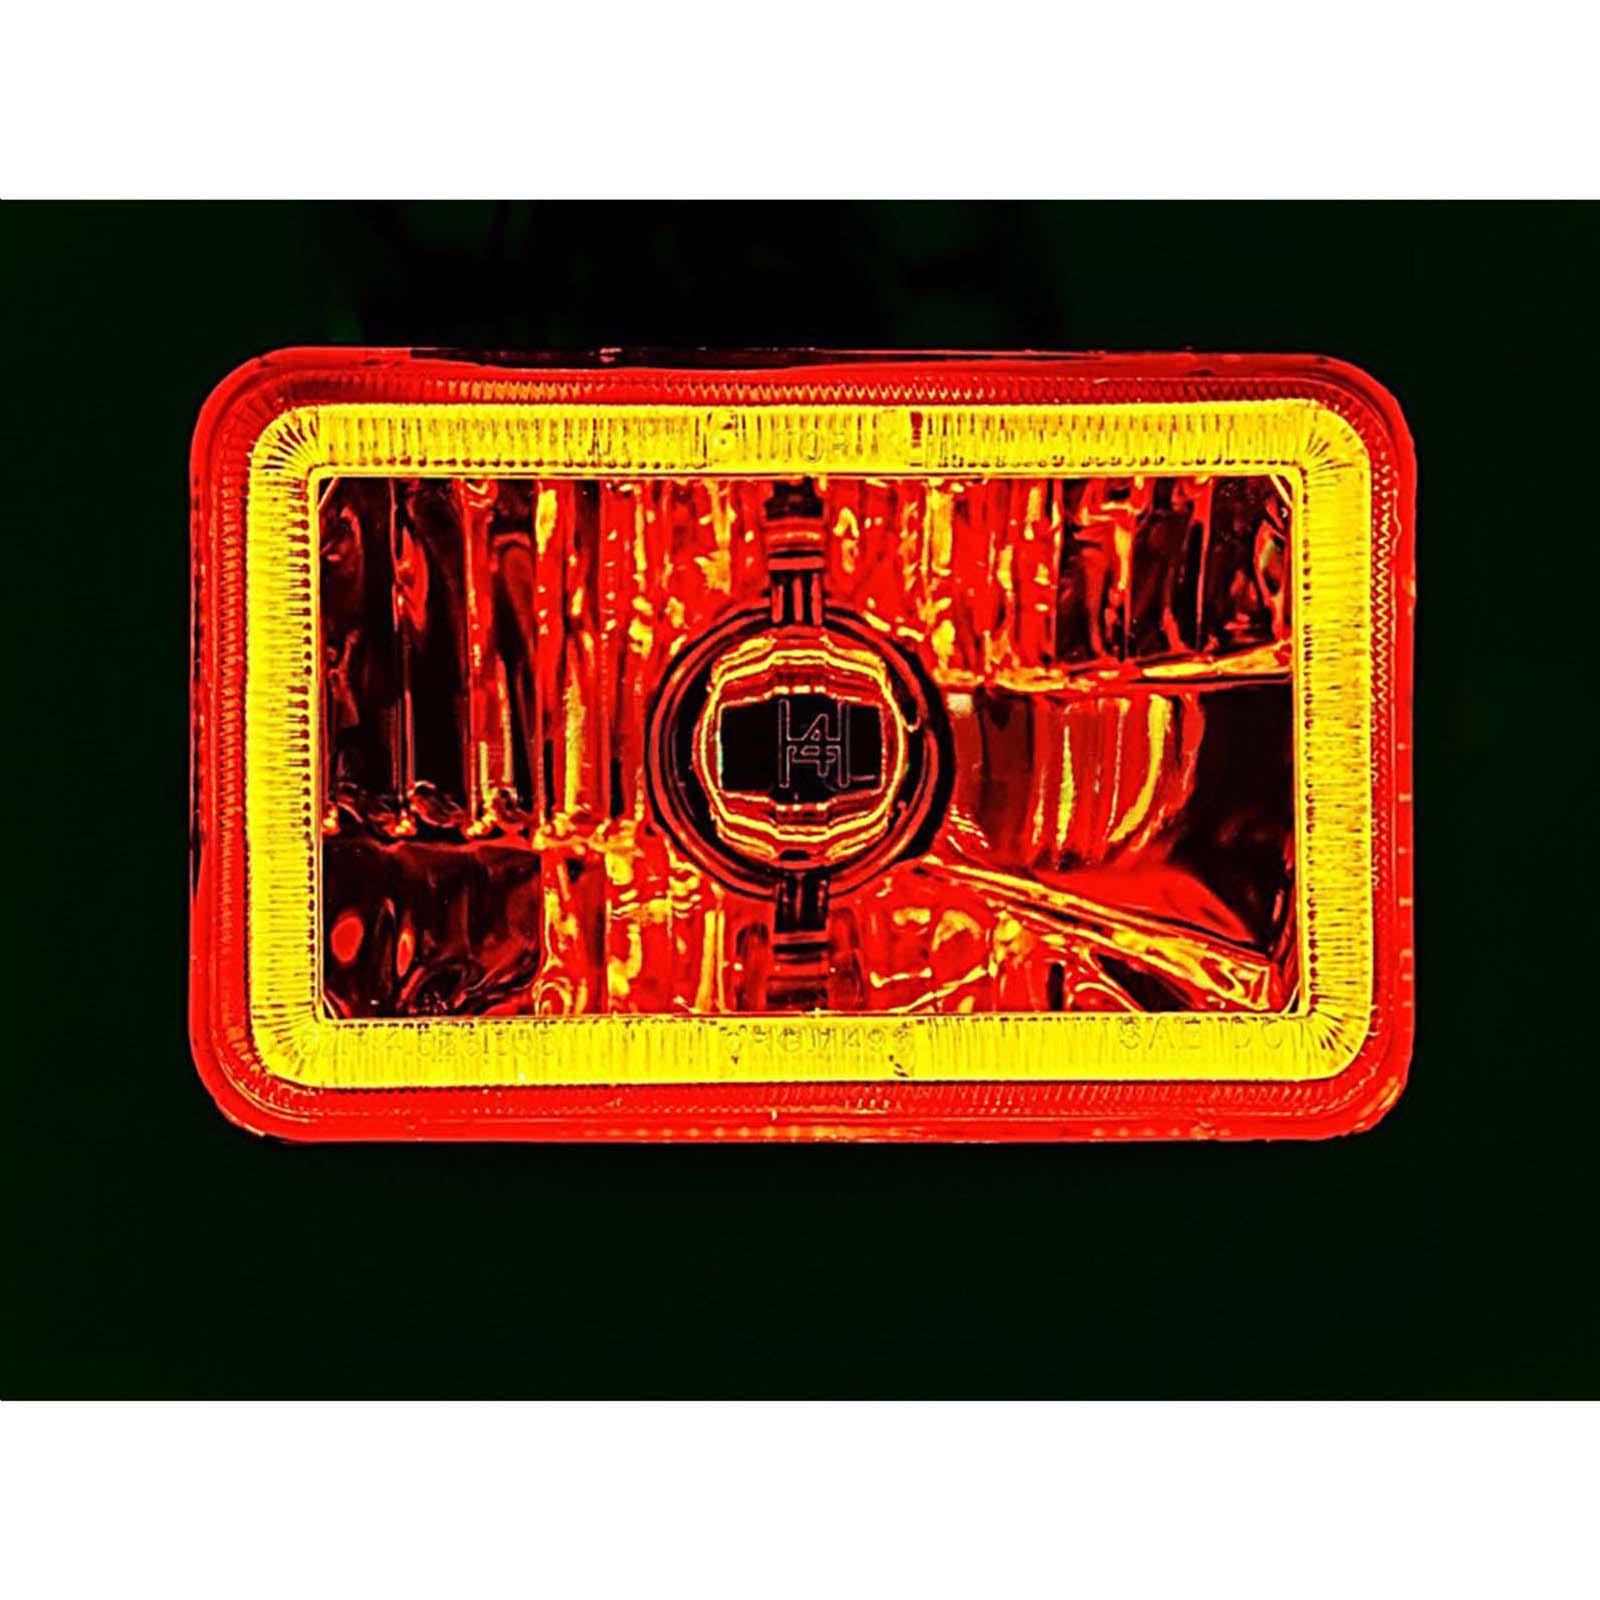 4X6 Amber LED COB Halo Crystal Glass//Metal Headlight Light Bulb Headlamp EACH